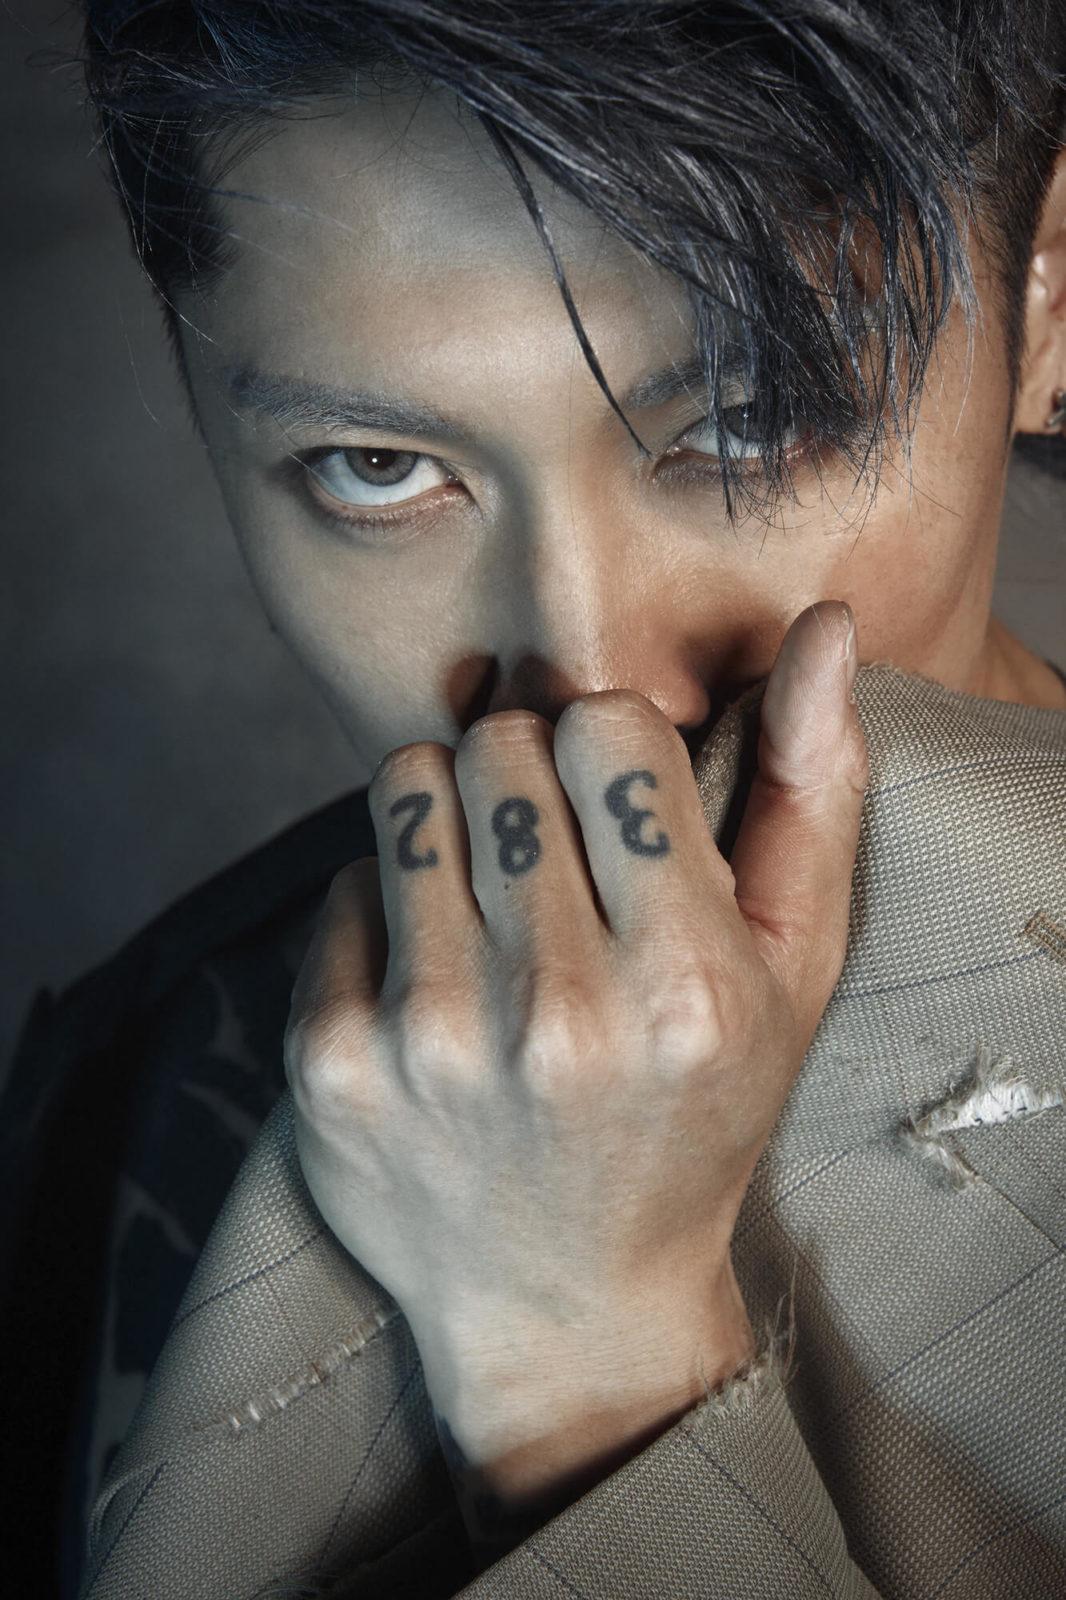 MIYAVI、『NO SLEEP TILL TOKYO』に収録の新曲スタジオセッションVer.をYouTubeにて初公開サムネイル画像